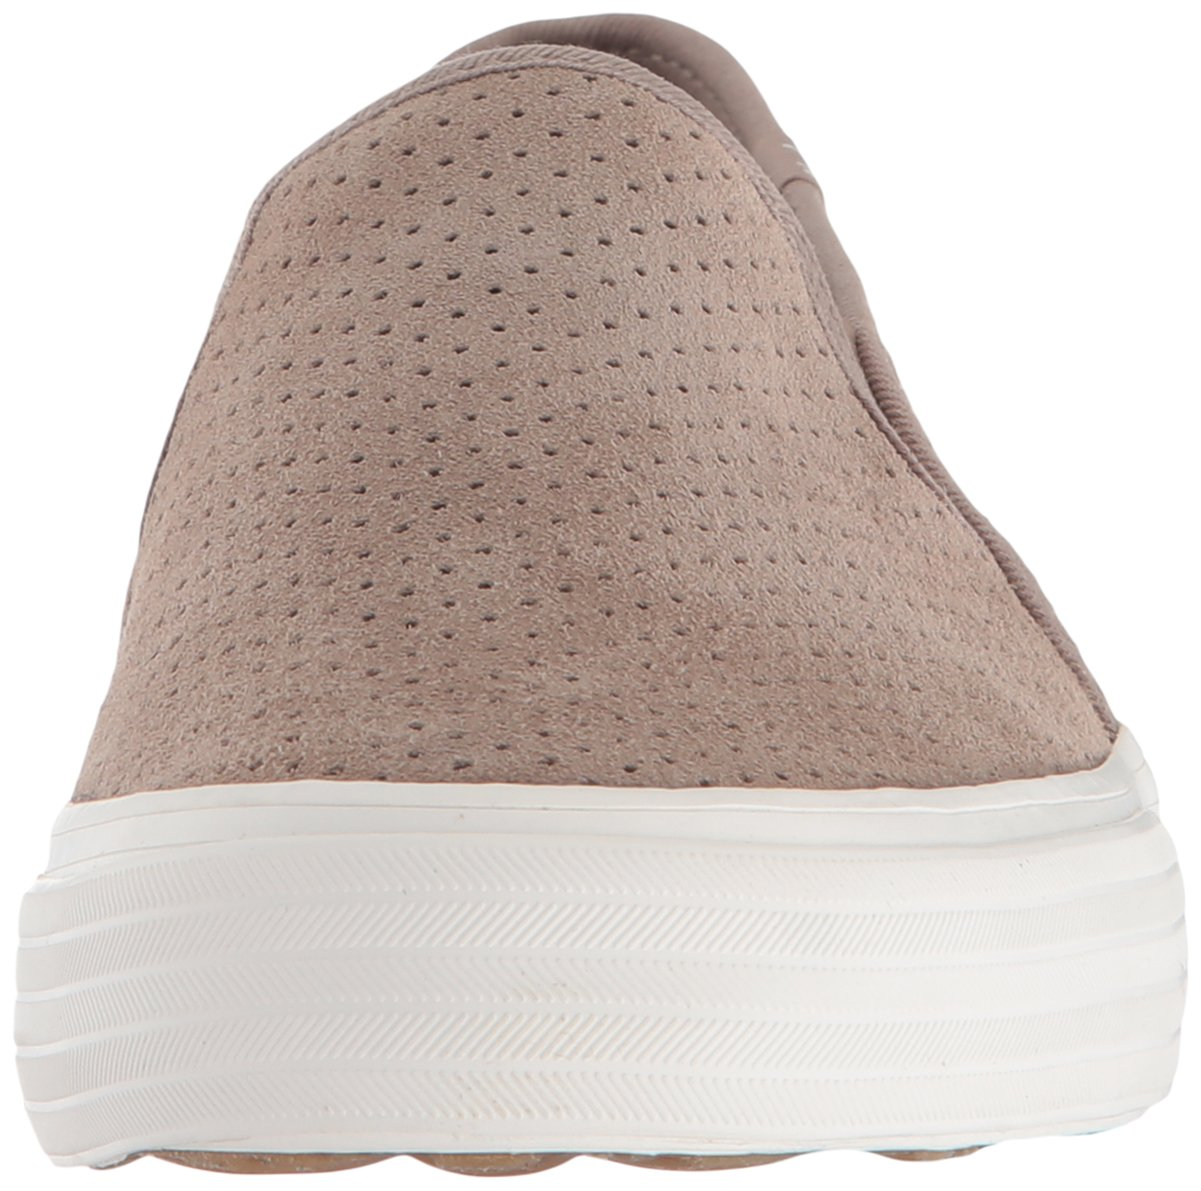 Keds Suede Women's Double Decker Perf Suede Keds Sneaker B078WKBGSM 6 M US|Taupe d153b9